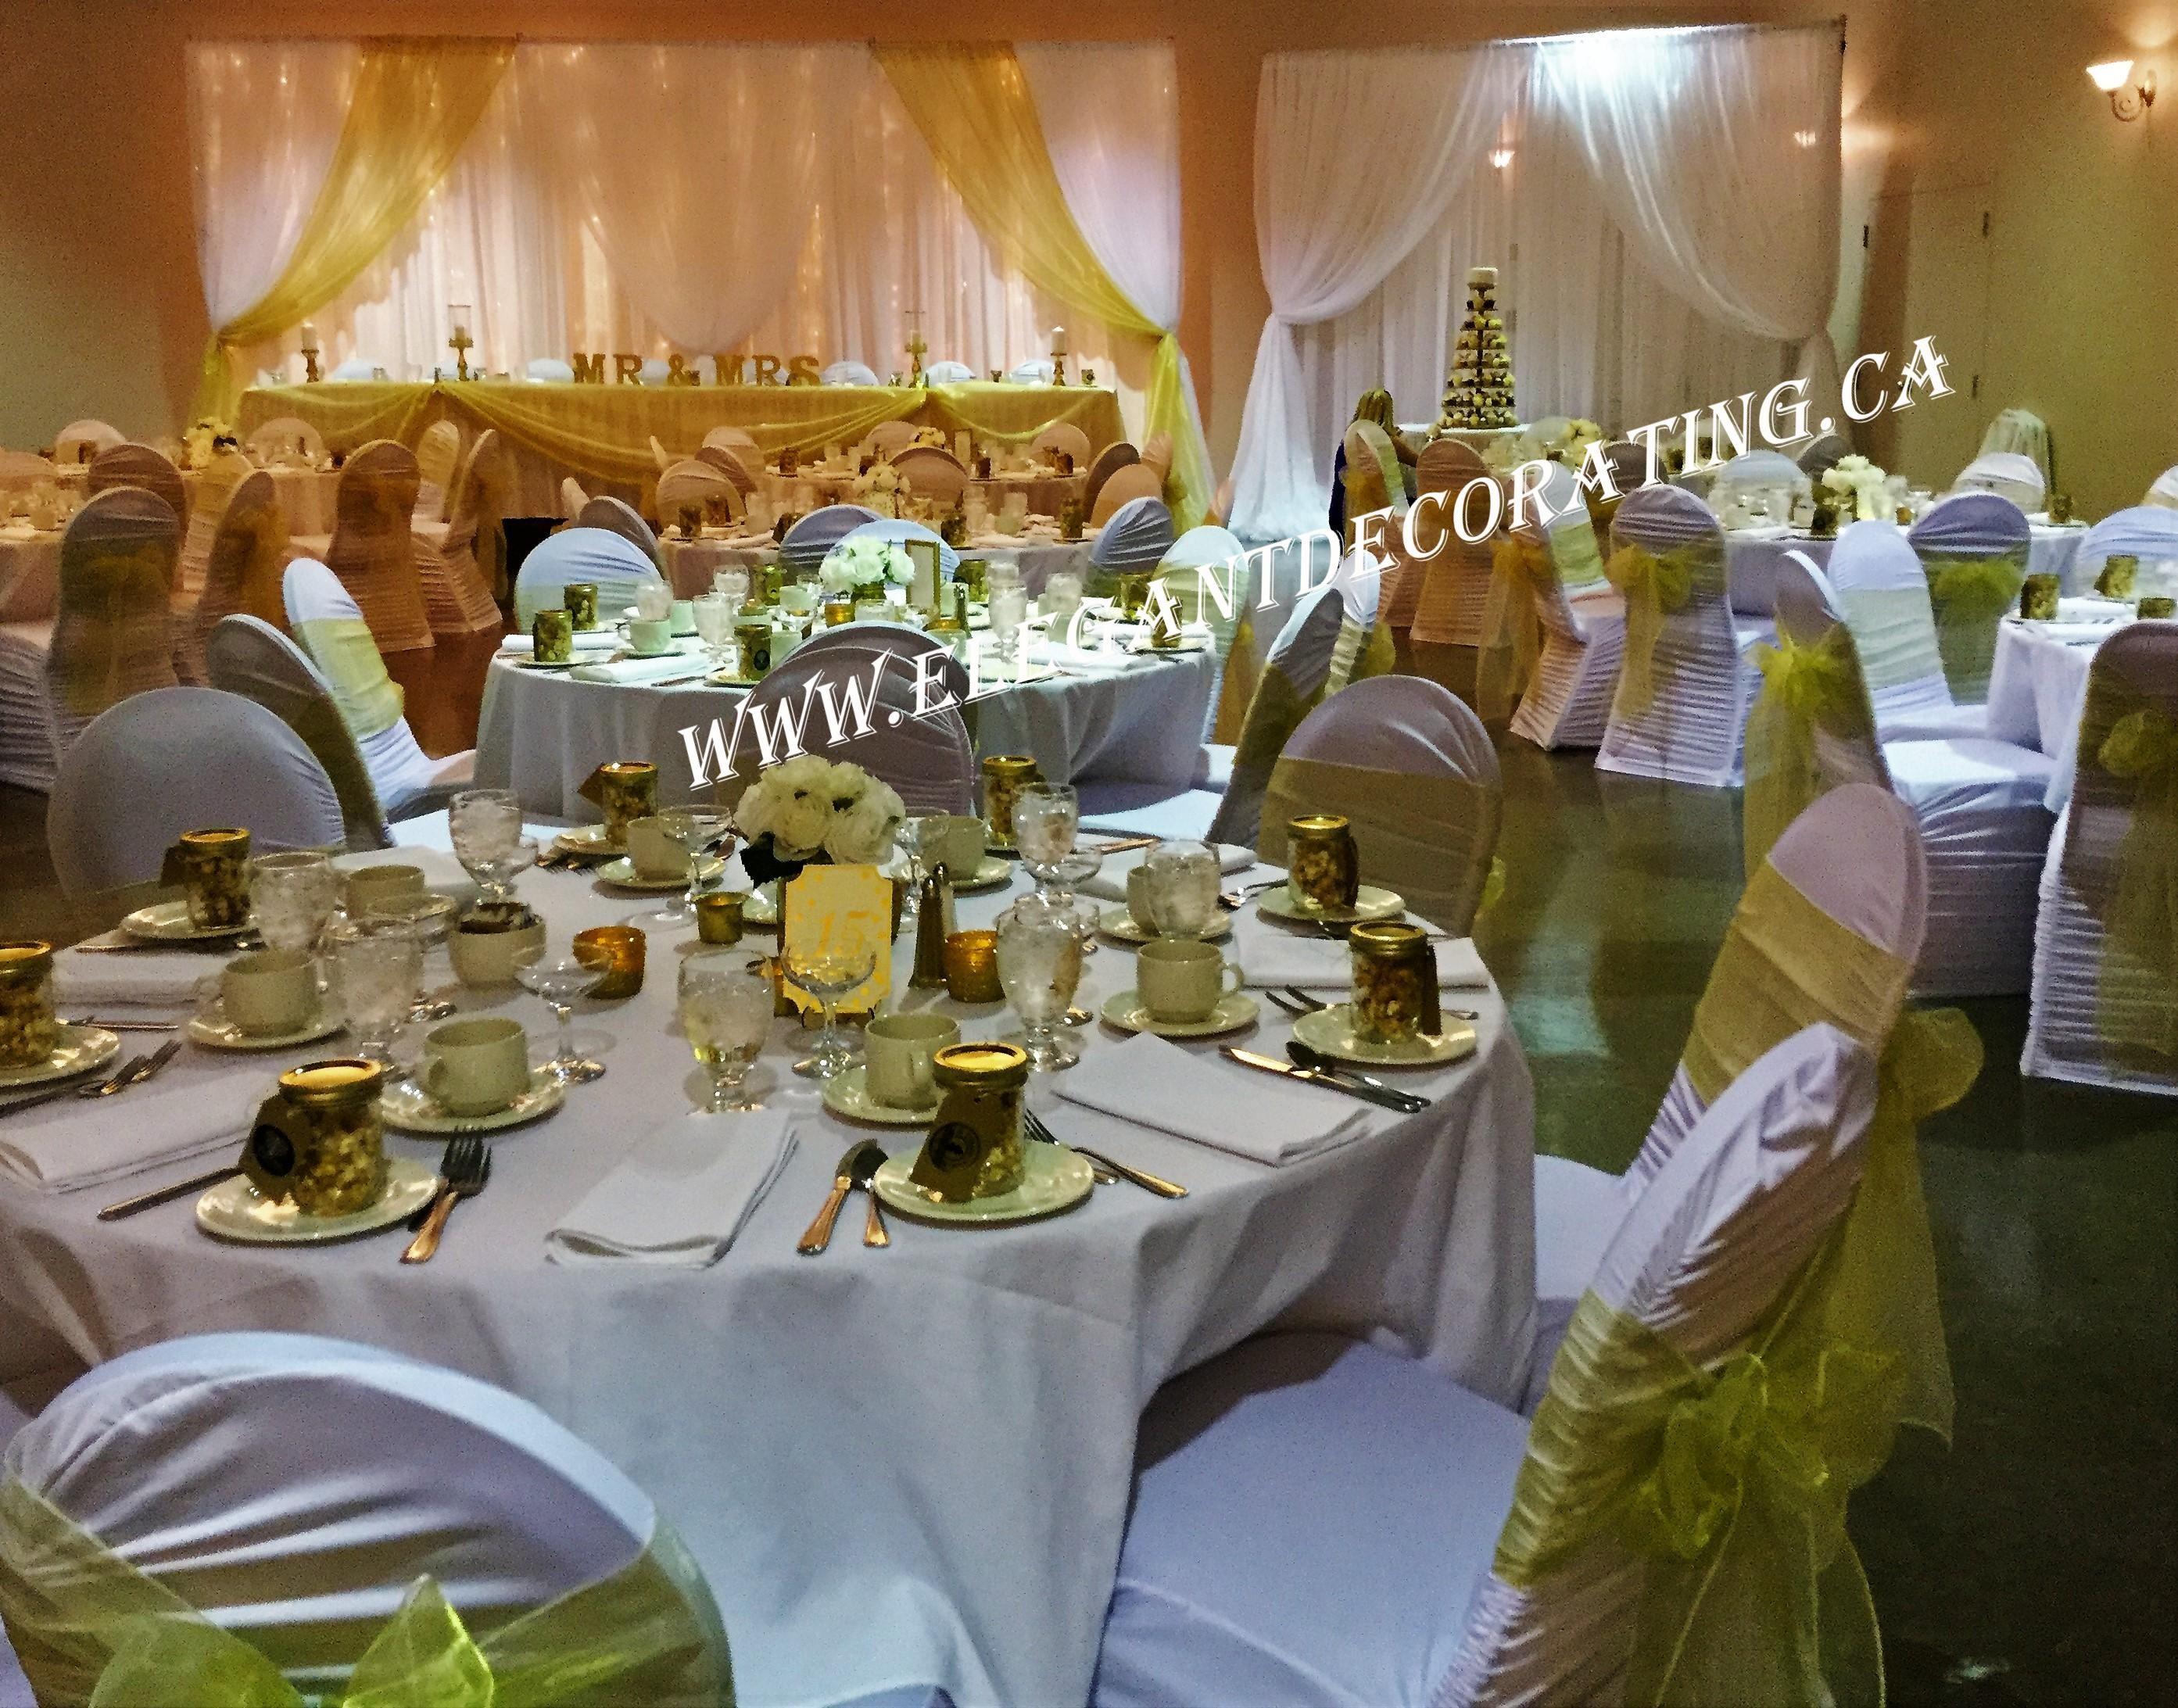 Fabric Draping Backdrop For Head Table Edmonton Wedding, Wedding Rentals,